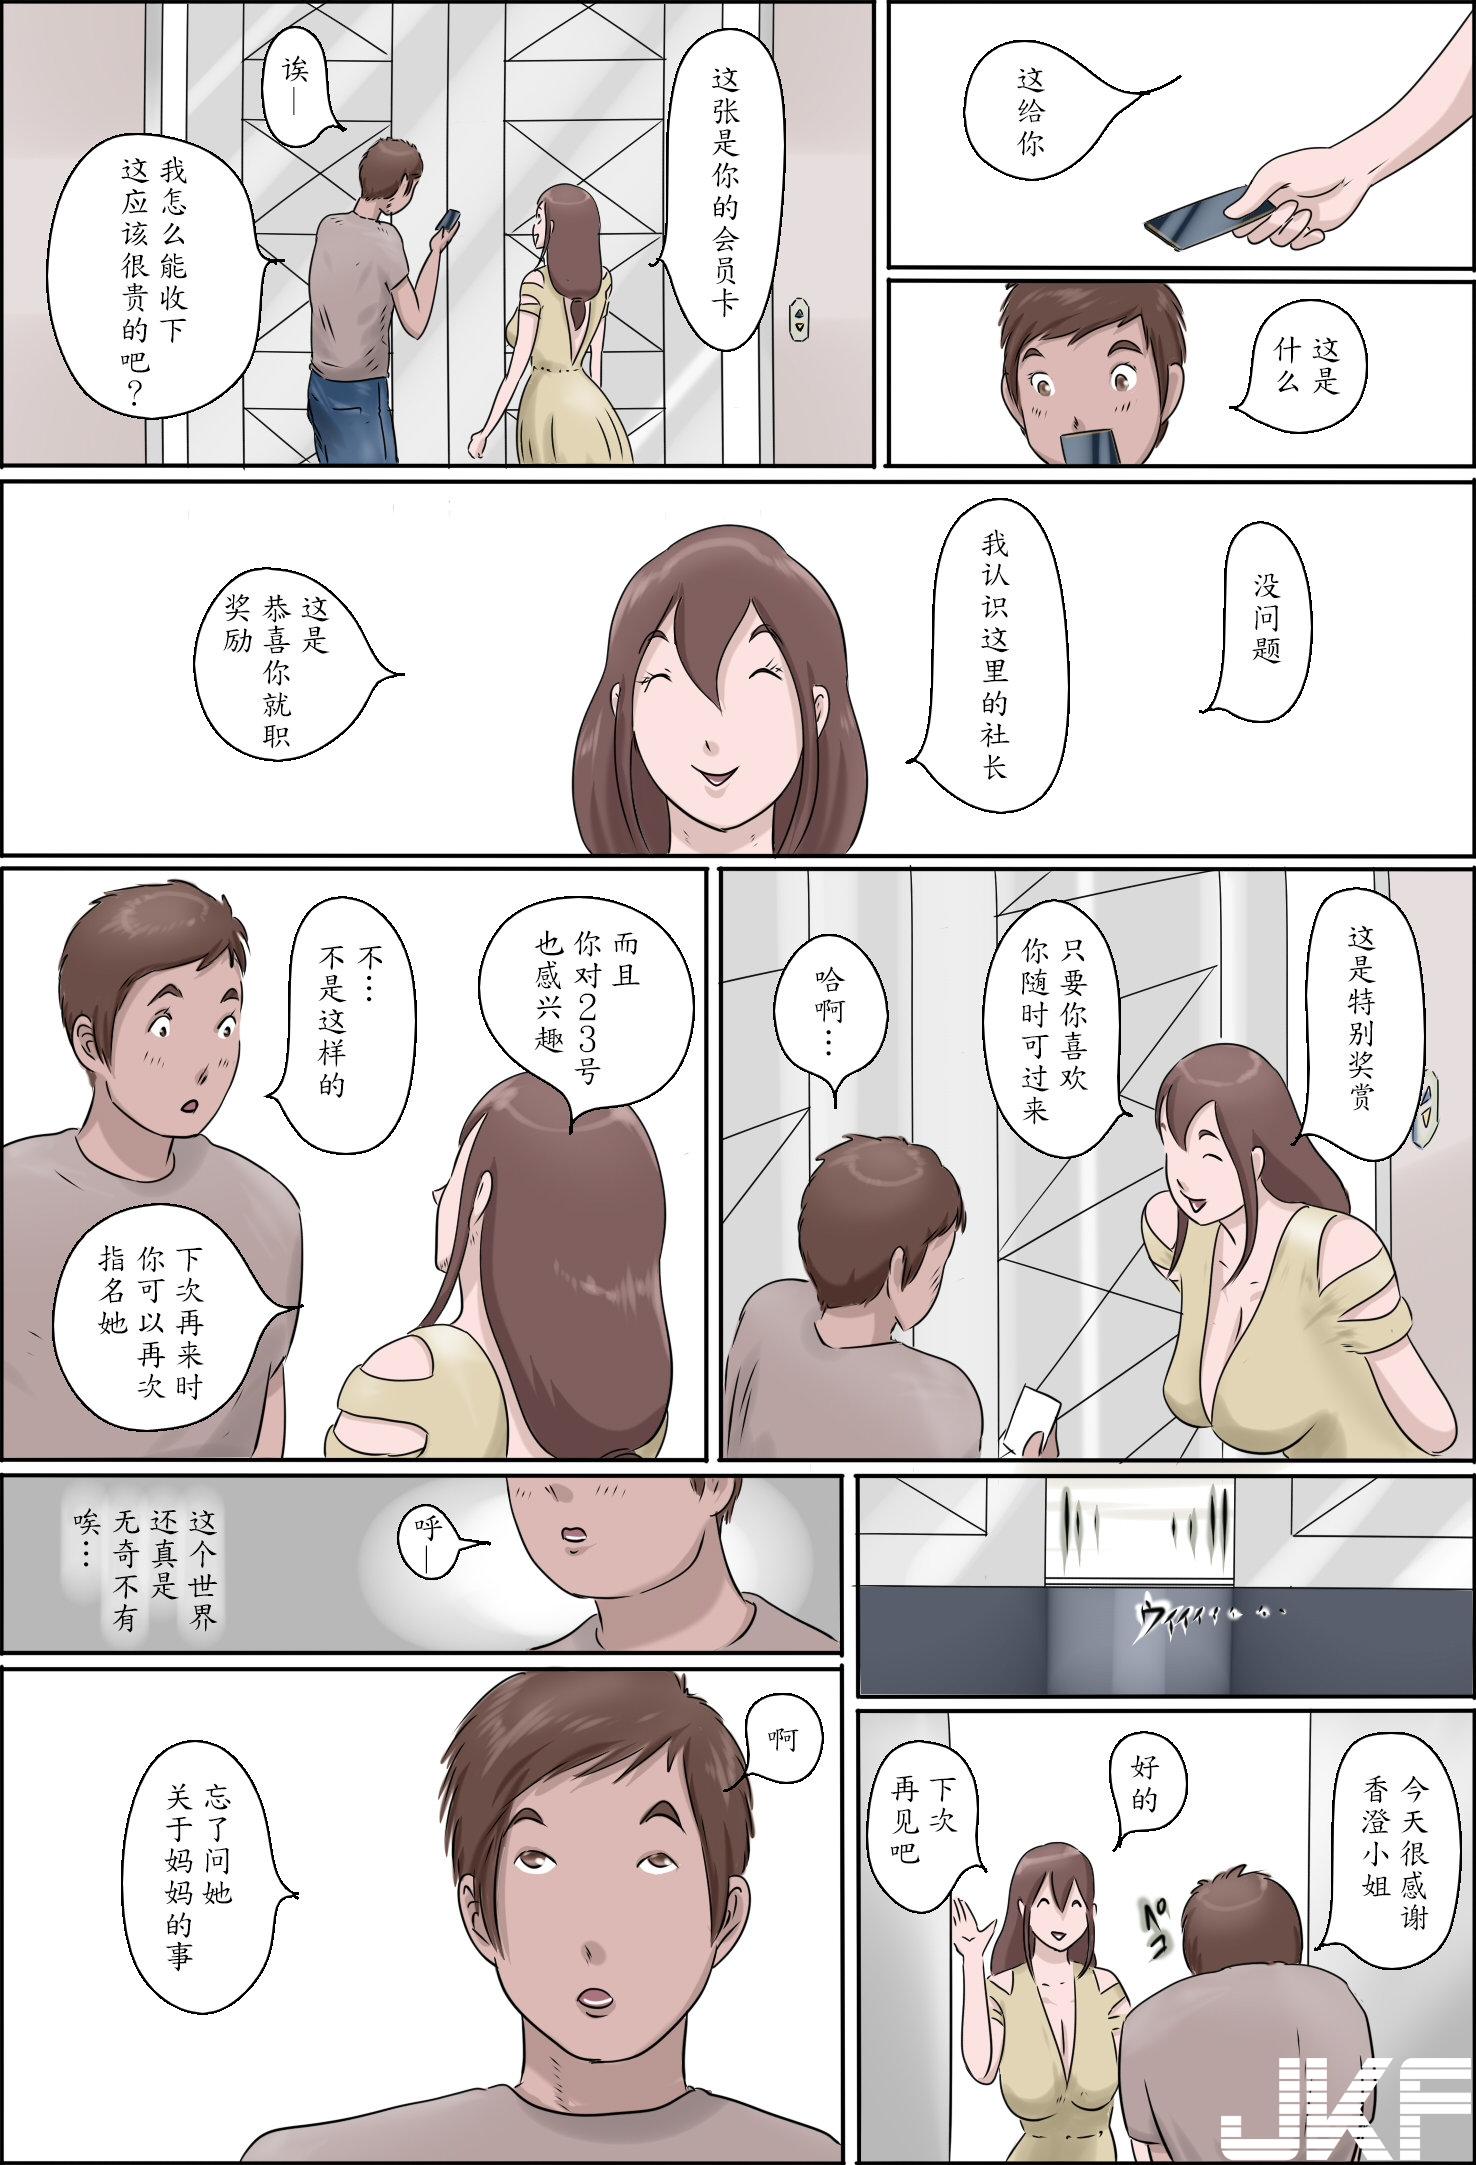 37_L_037.jpg